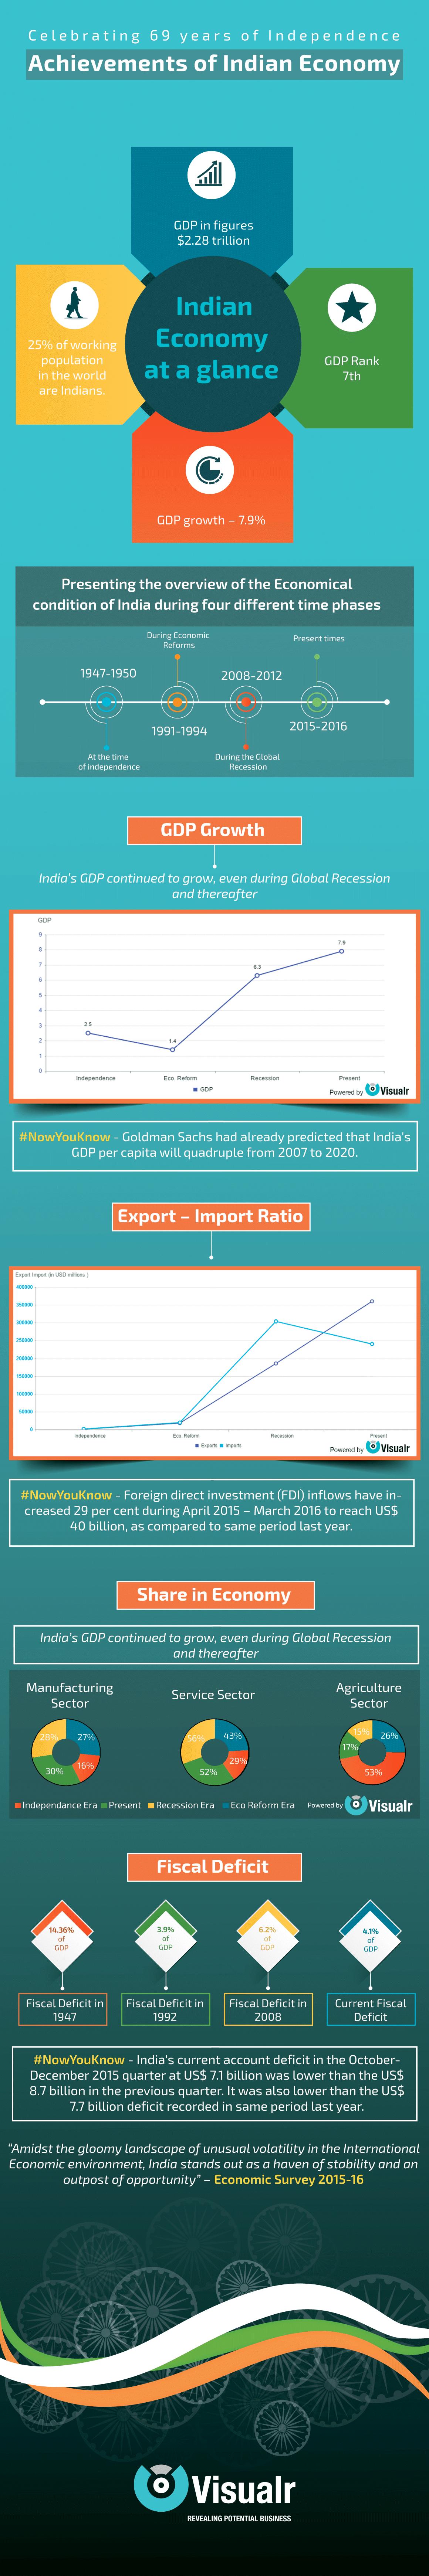 Achievement Of Indian Economy India Independence Infographic Bigdata Datav Data Visualization Software Big Essay